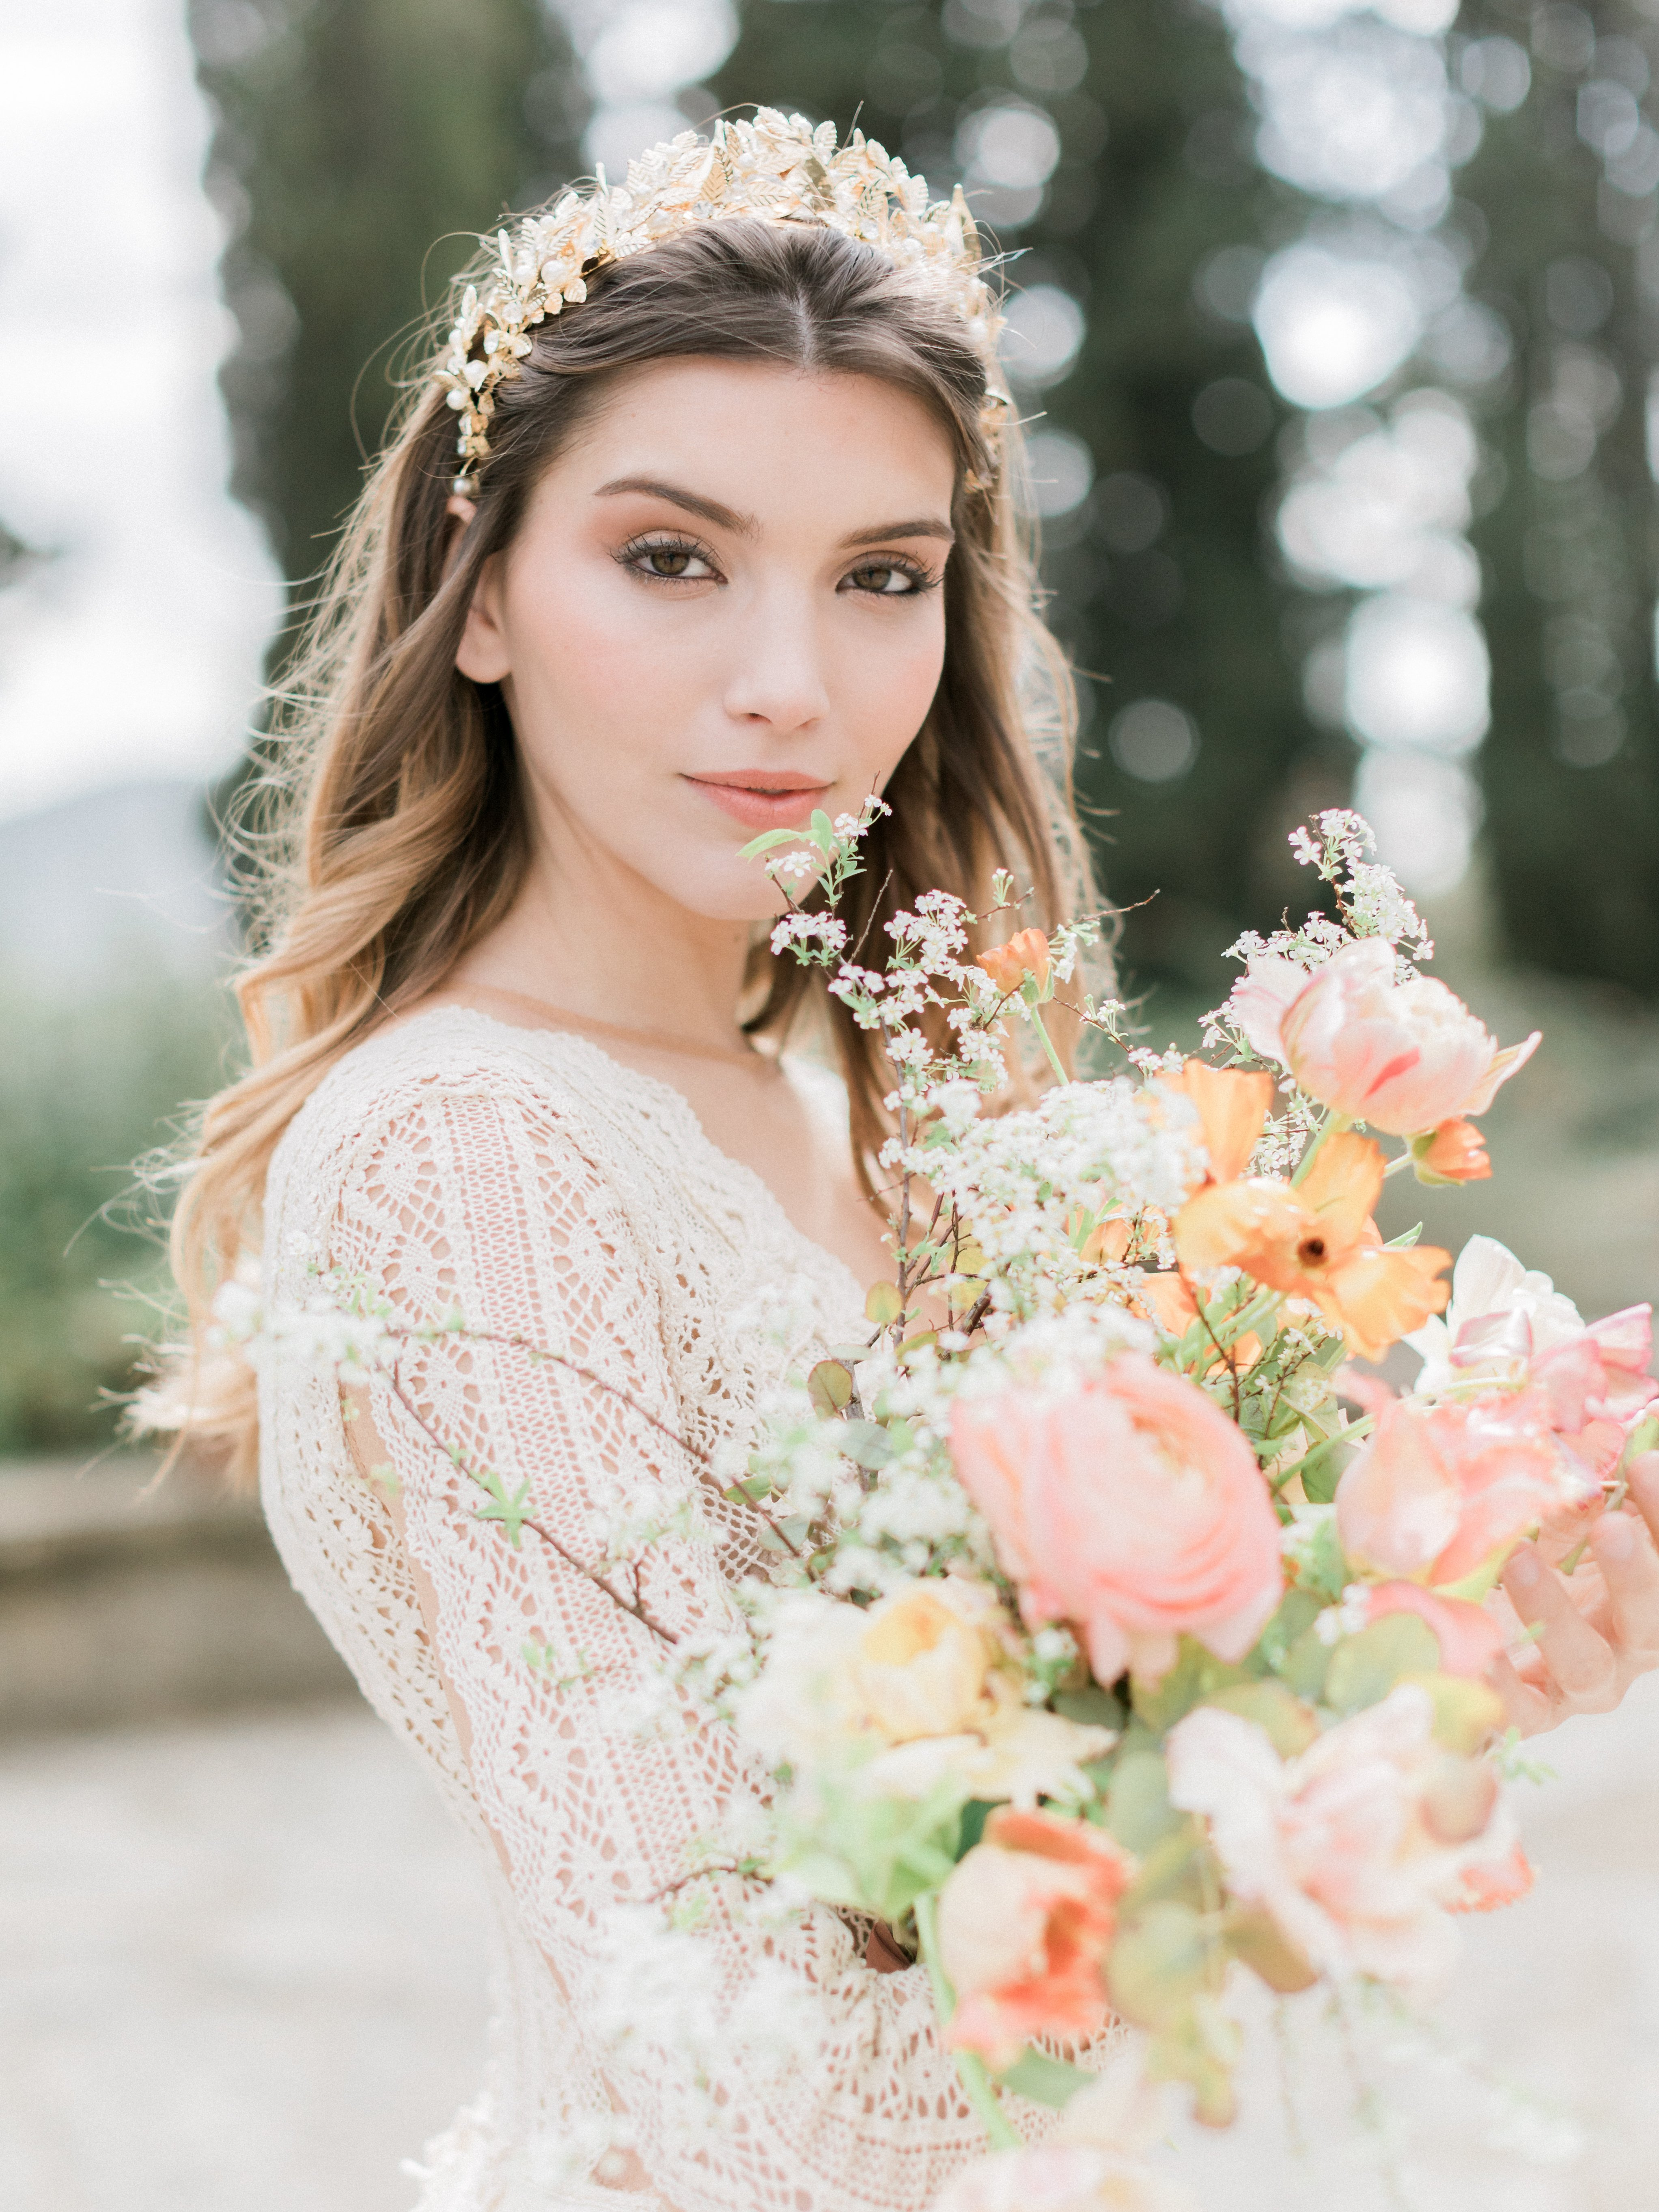 italy-spain-barcelona-elopement-wedding-planner-flower-designer-14876